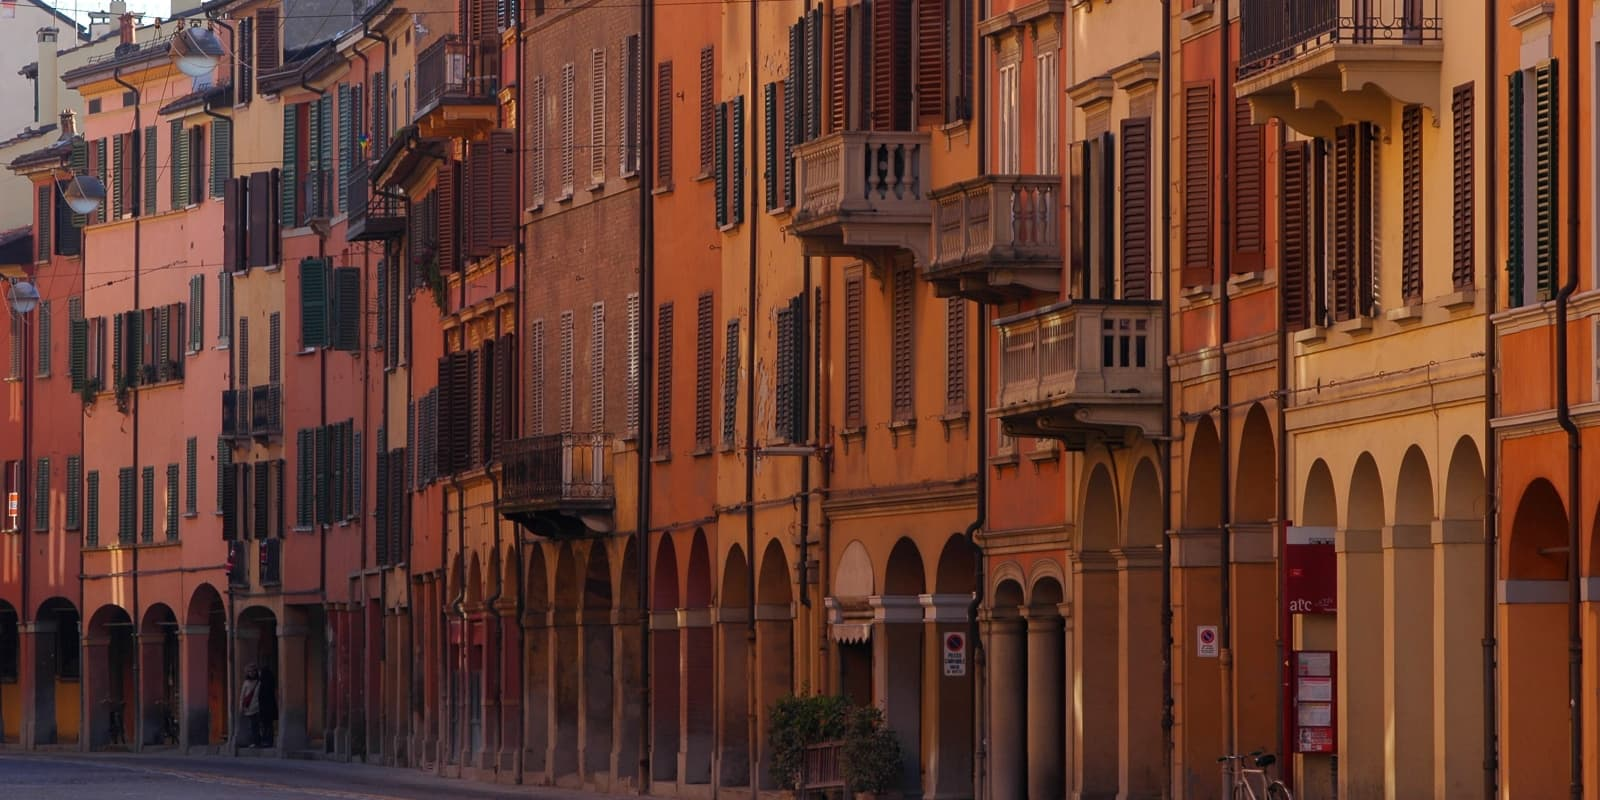 5 cose da fare gratis (o quasi) a Bologna